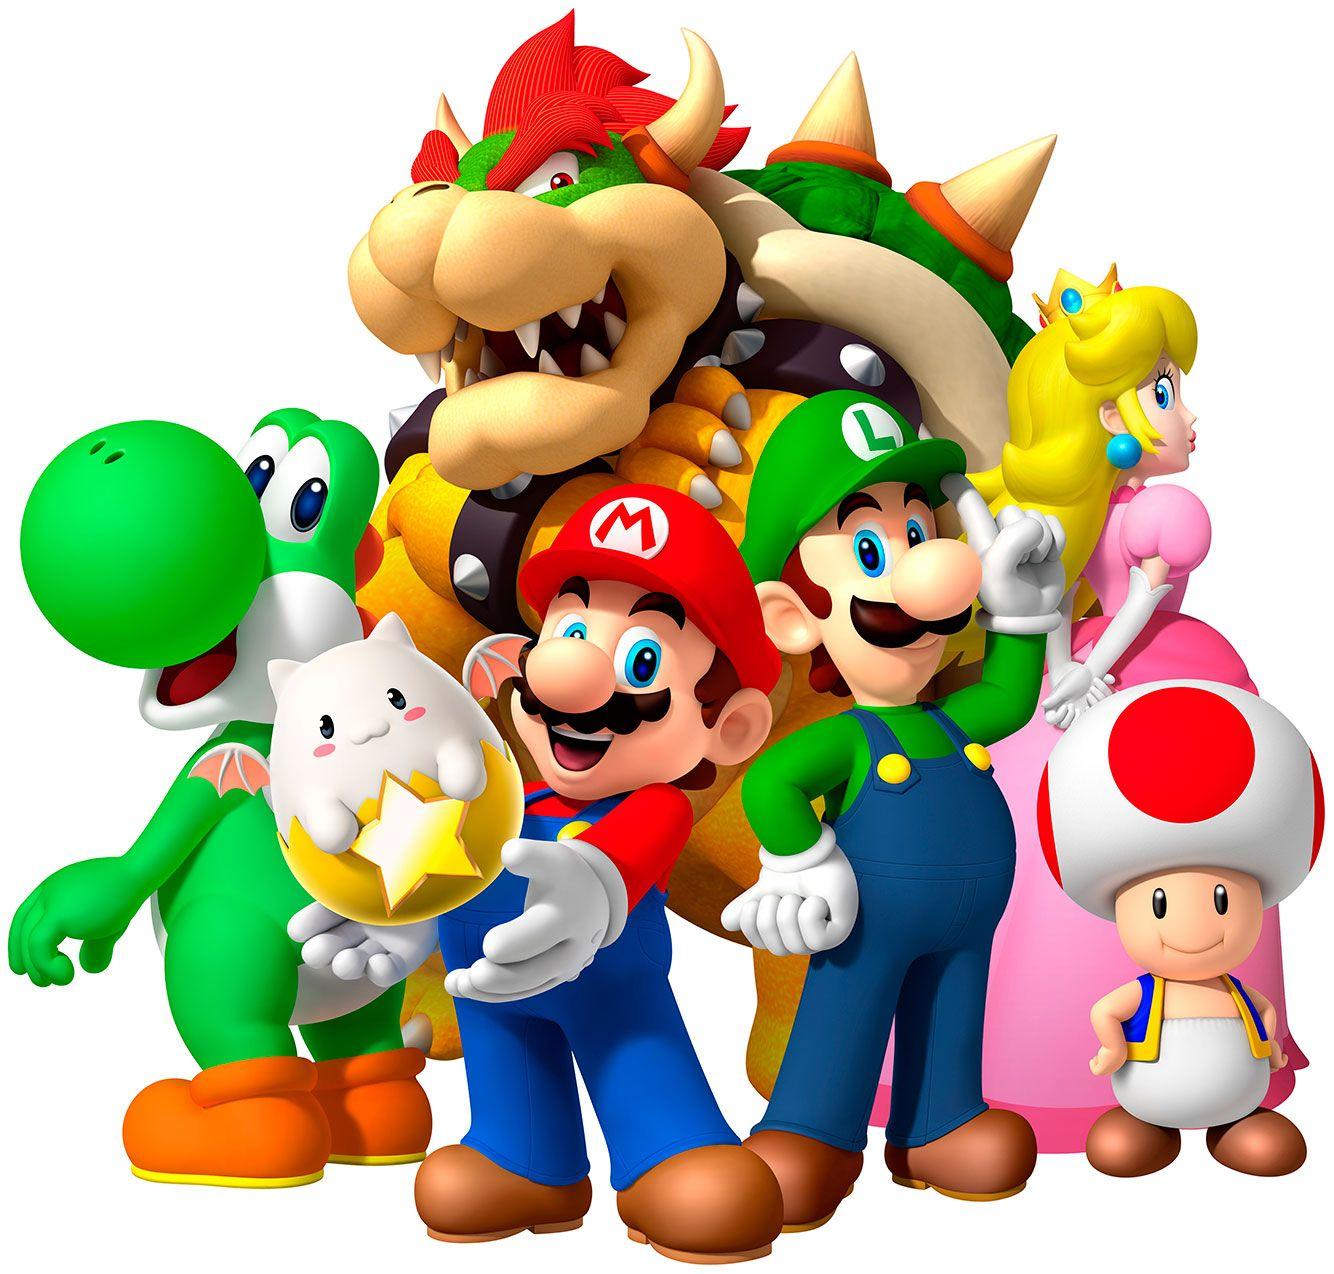 Super Mario Brothers Picture